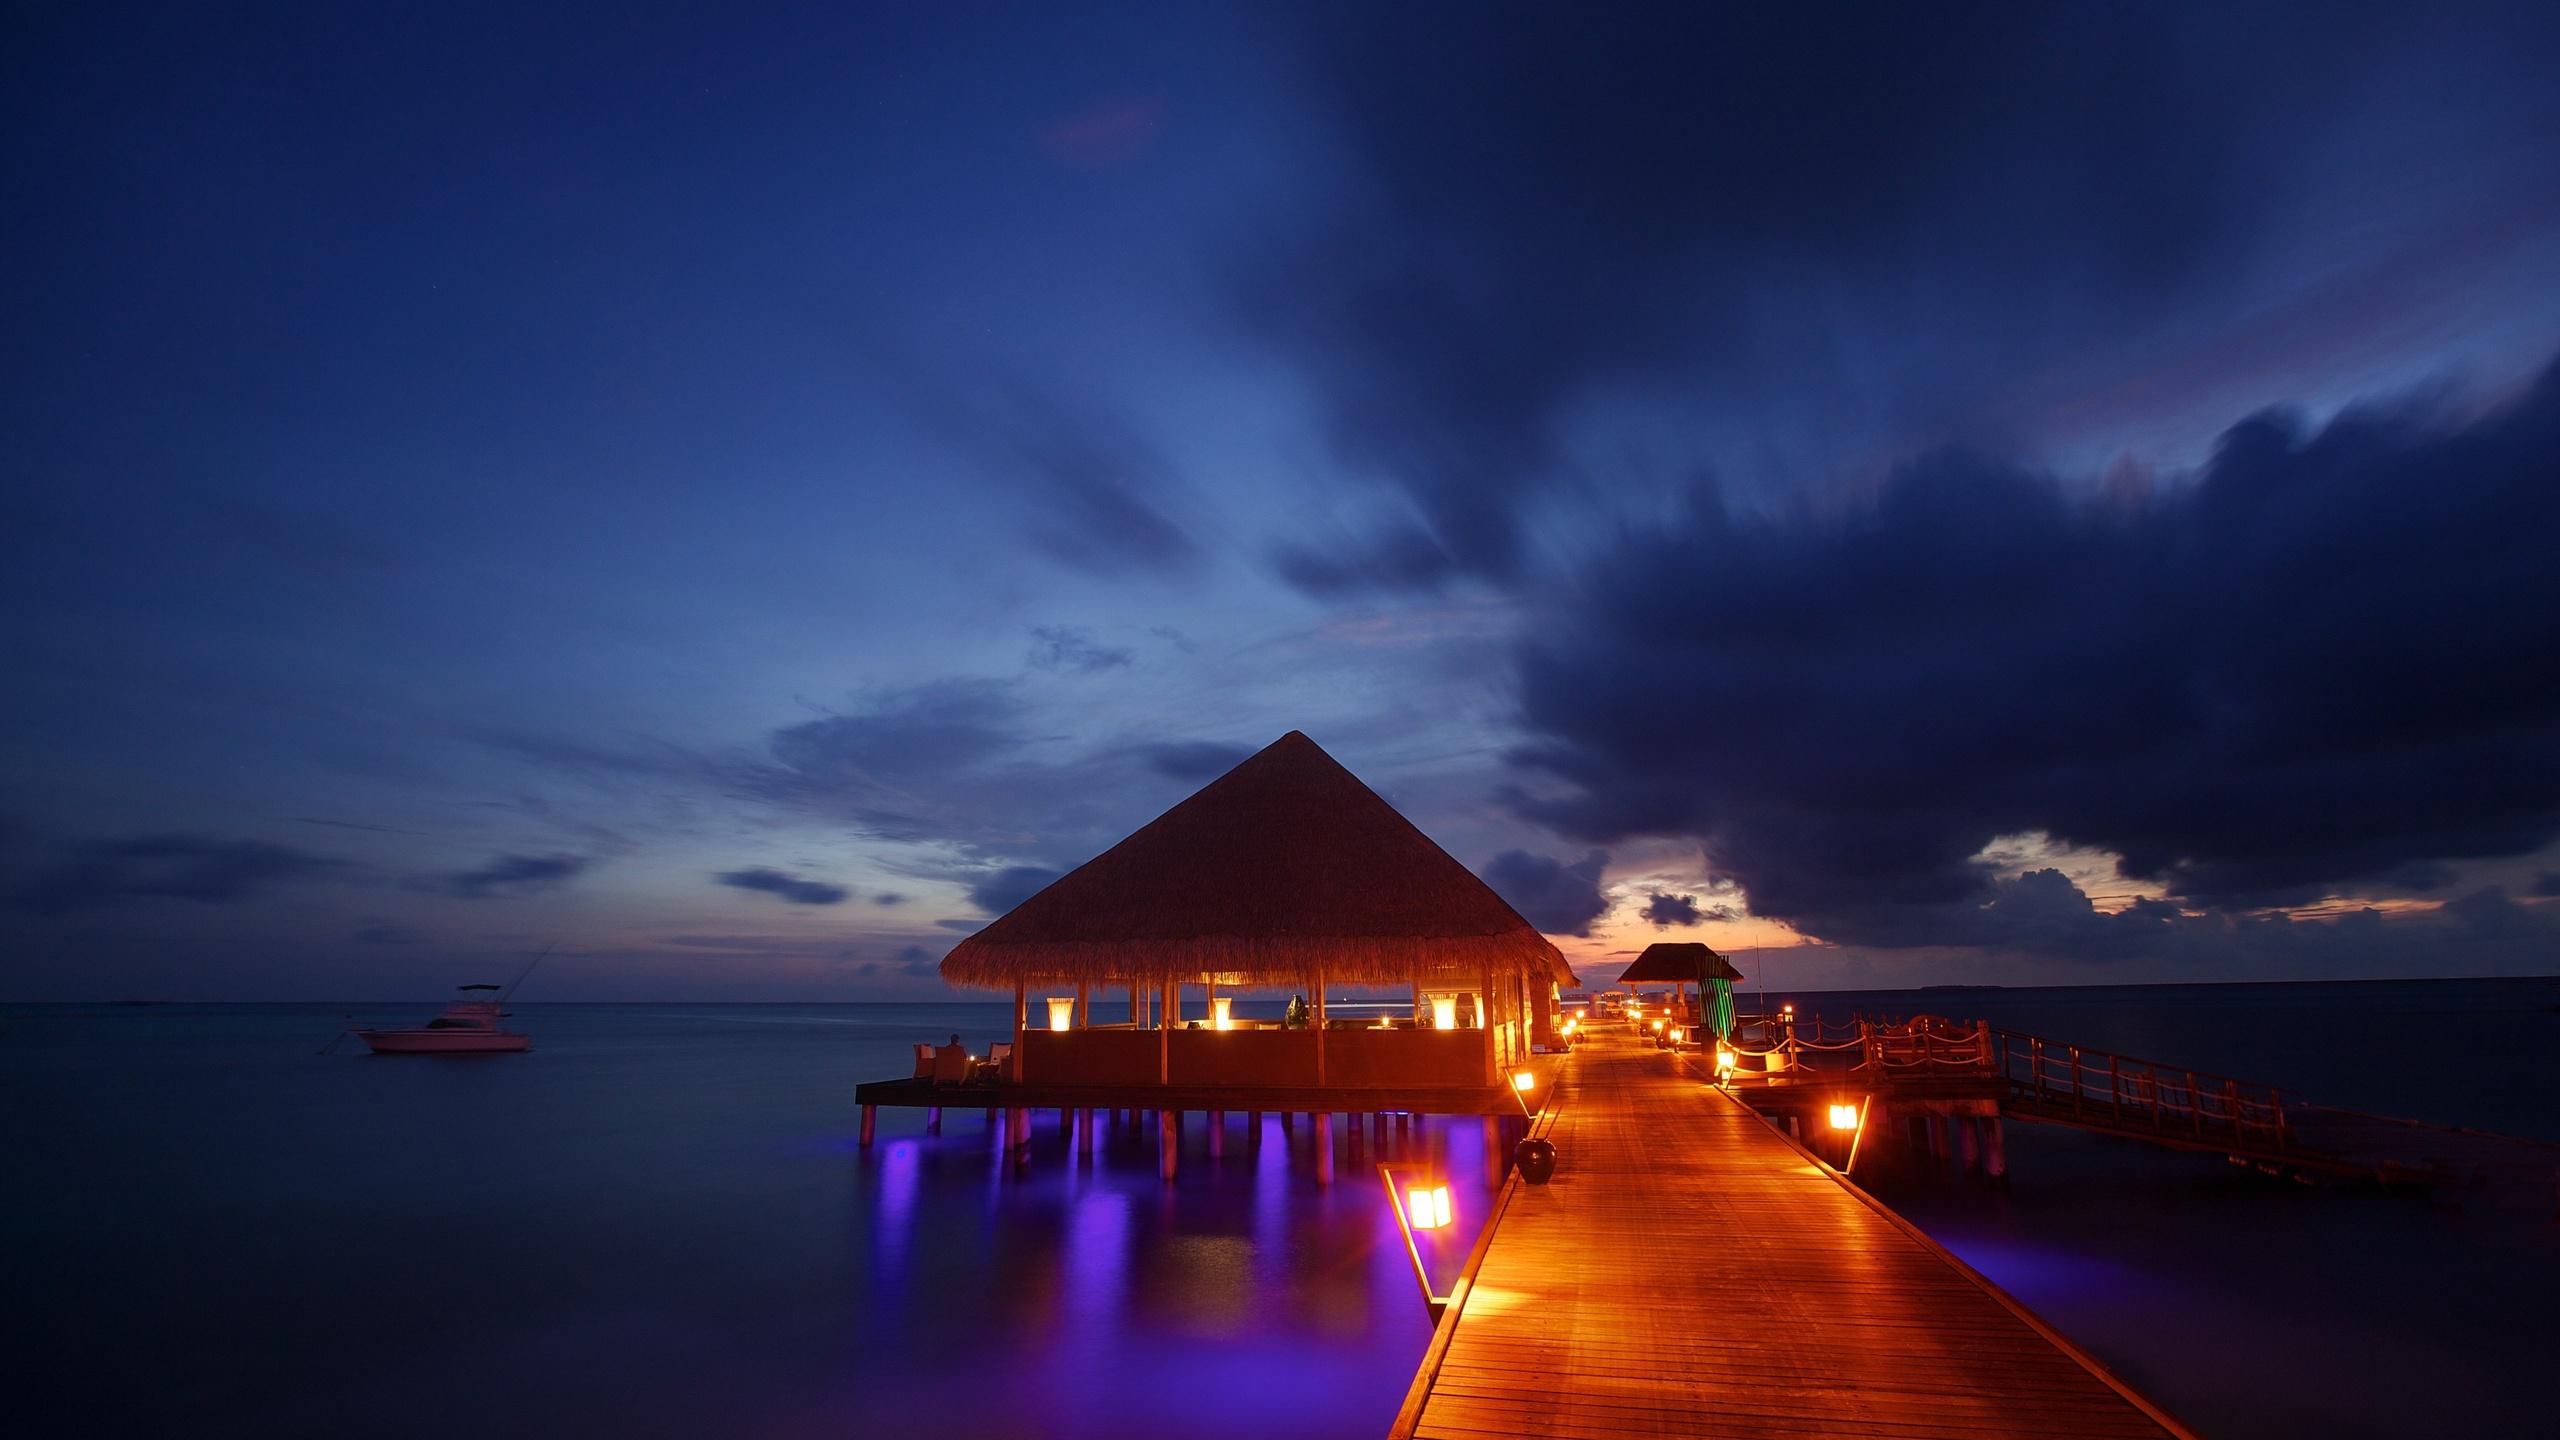 ... beach bungalow ocean sea sunset reflection wallpaper background